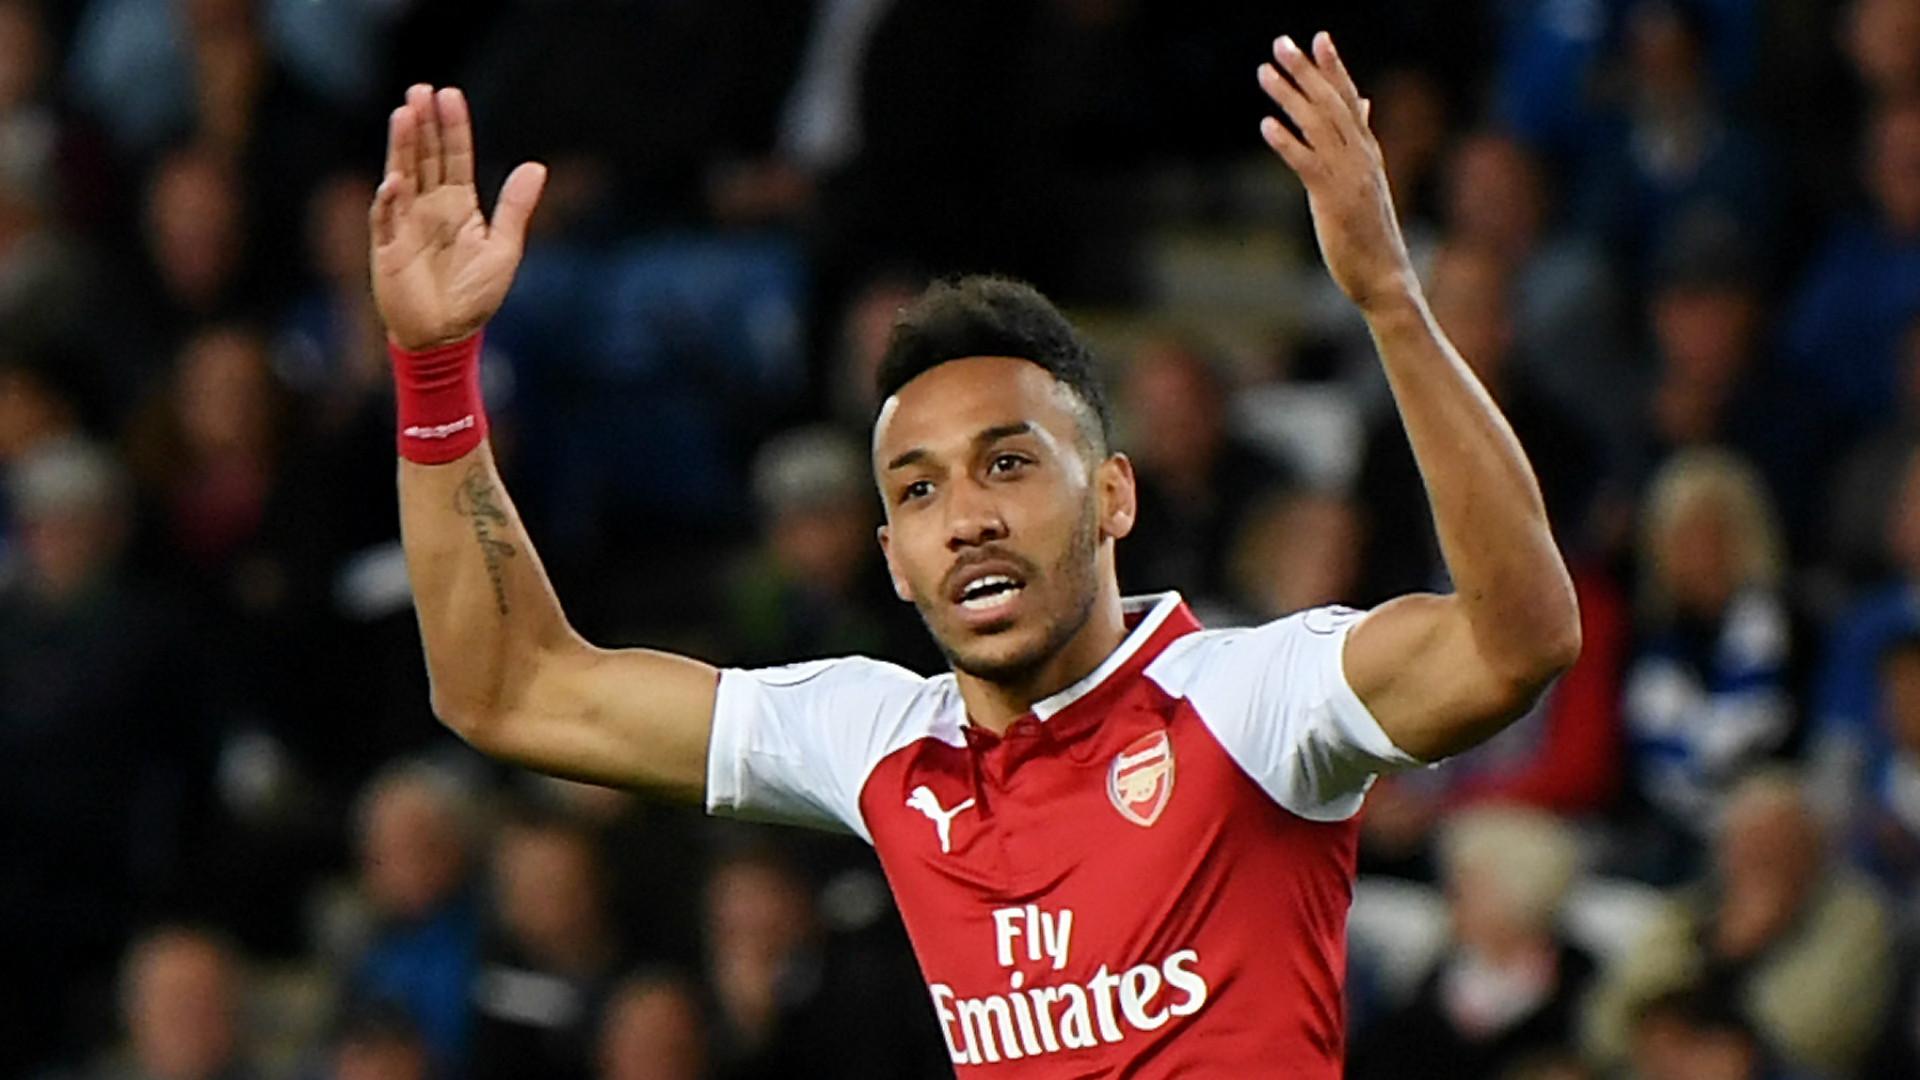 arsenal sign premier league�s biggest sleeve sponsor deal